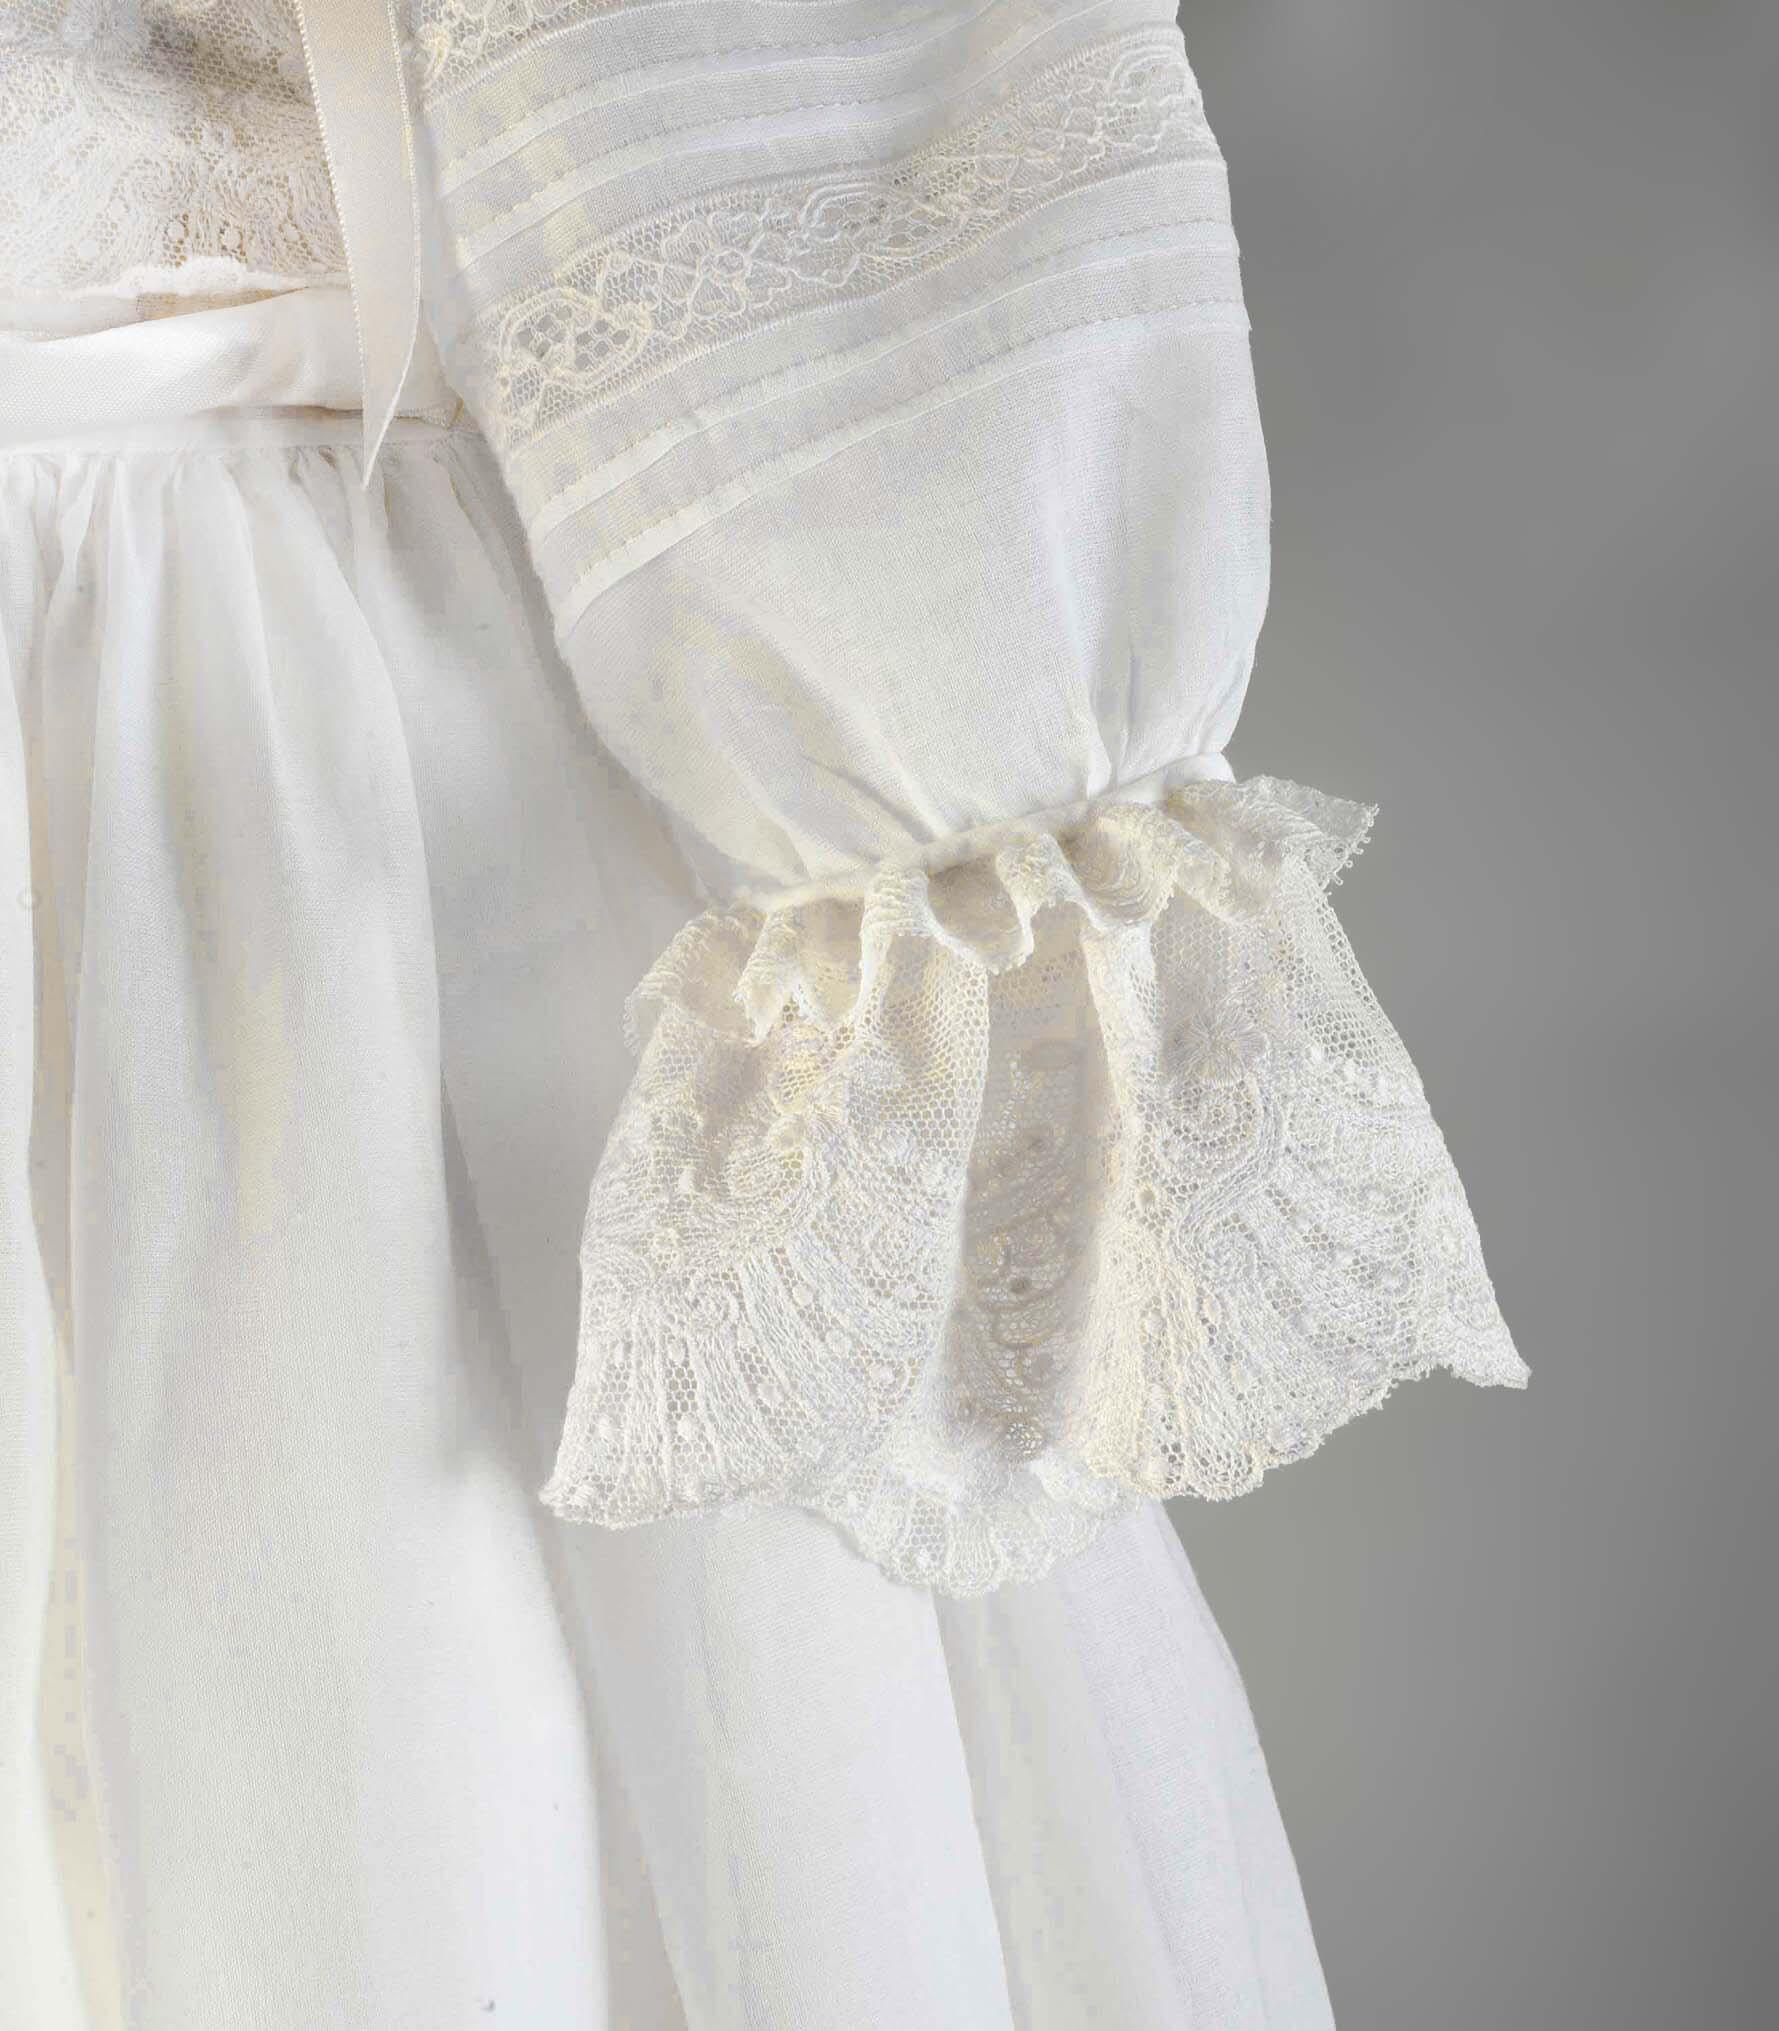 5766e7c5d Traje De Bautizo A Crochet Para Nias De La Web Vestidos De ...